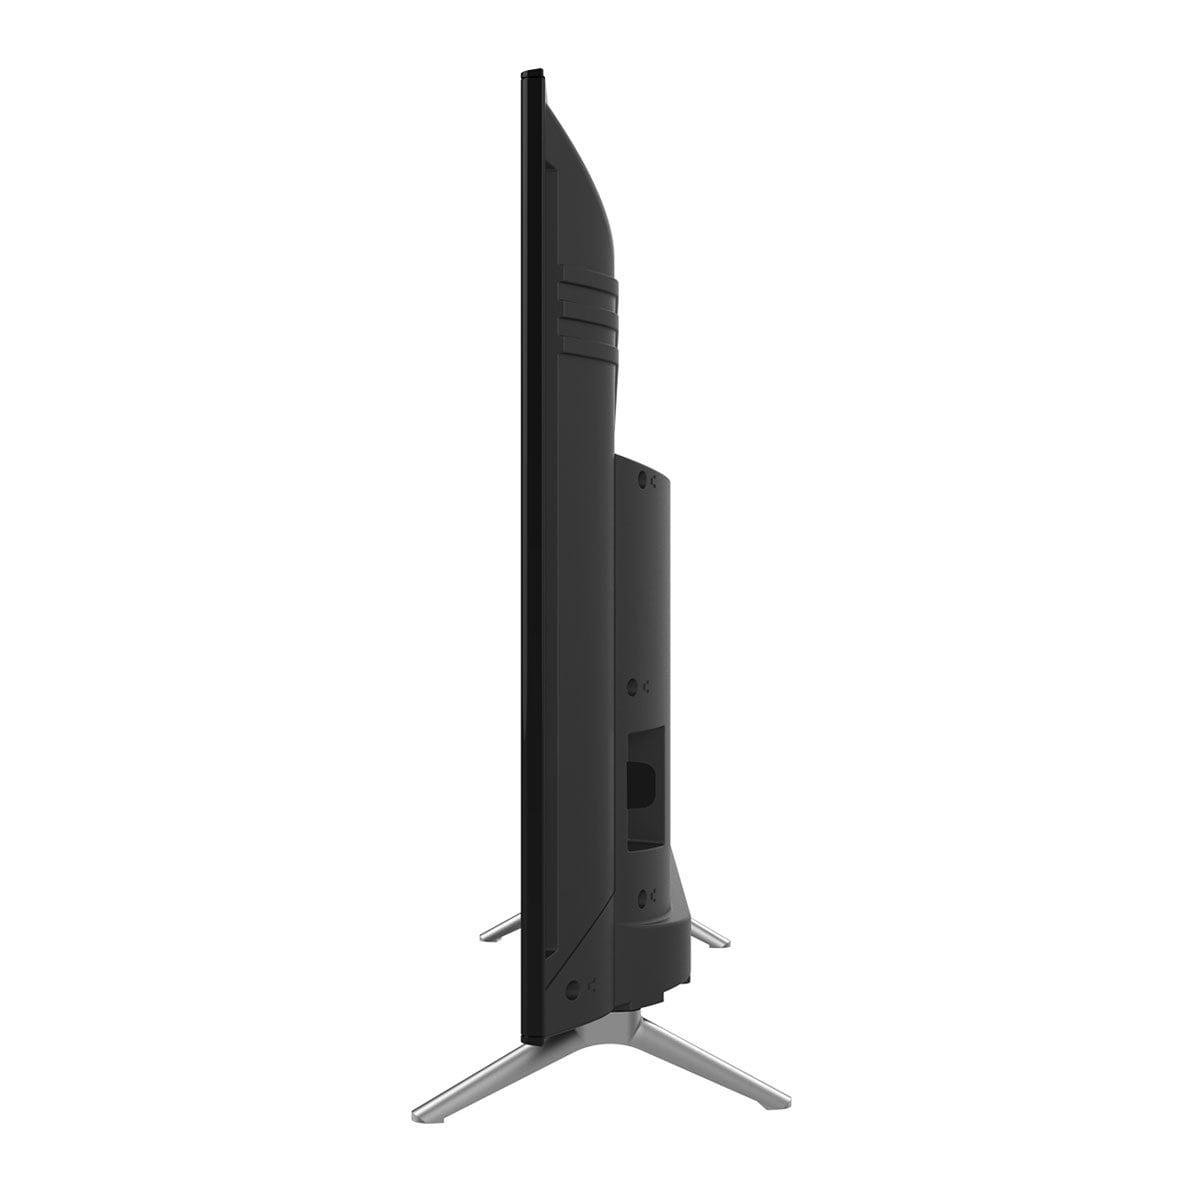 "Pantalla Tcl 49"" Led 4K Uhd Smart con Roku Mod.49S405-Mx"